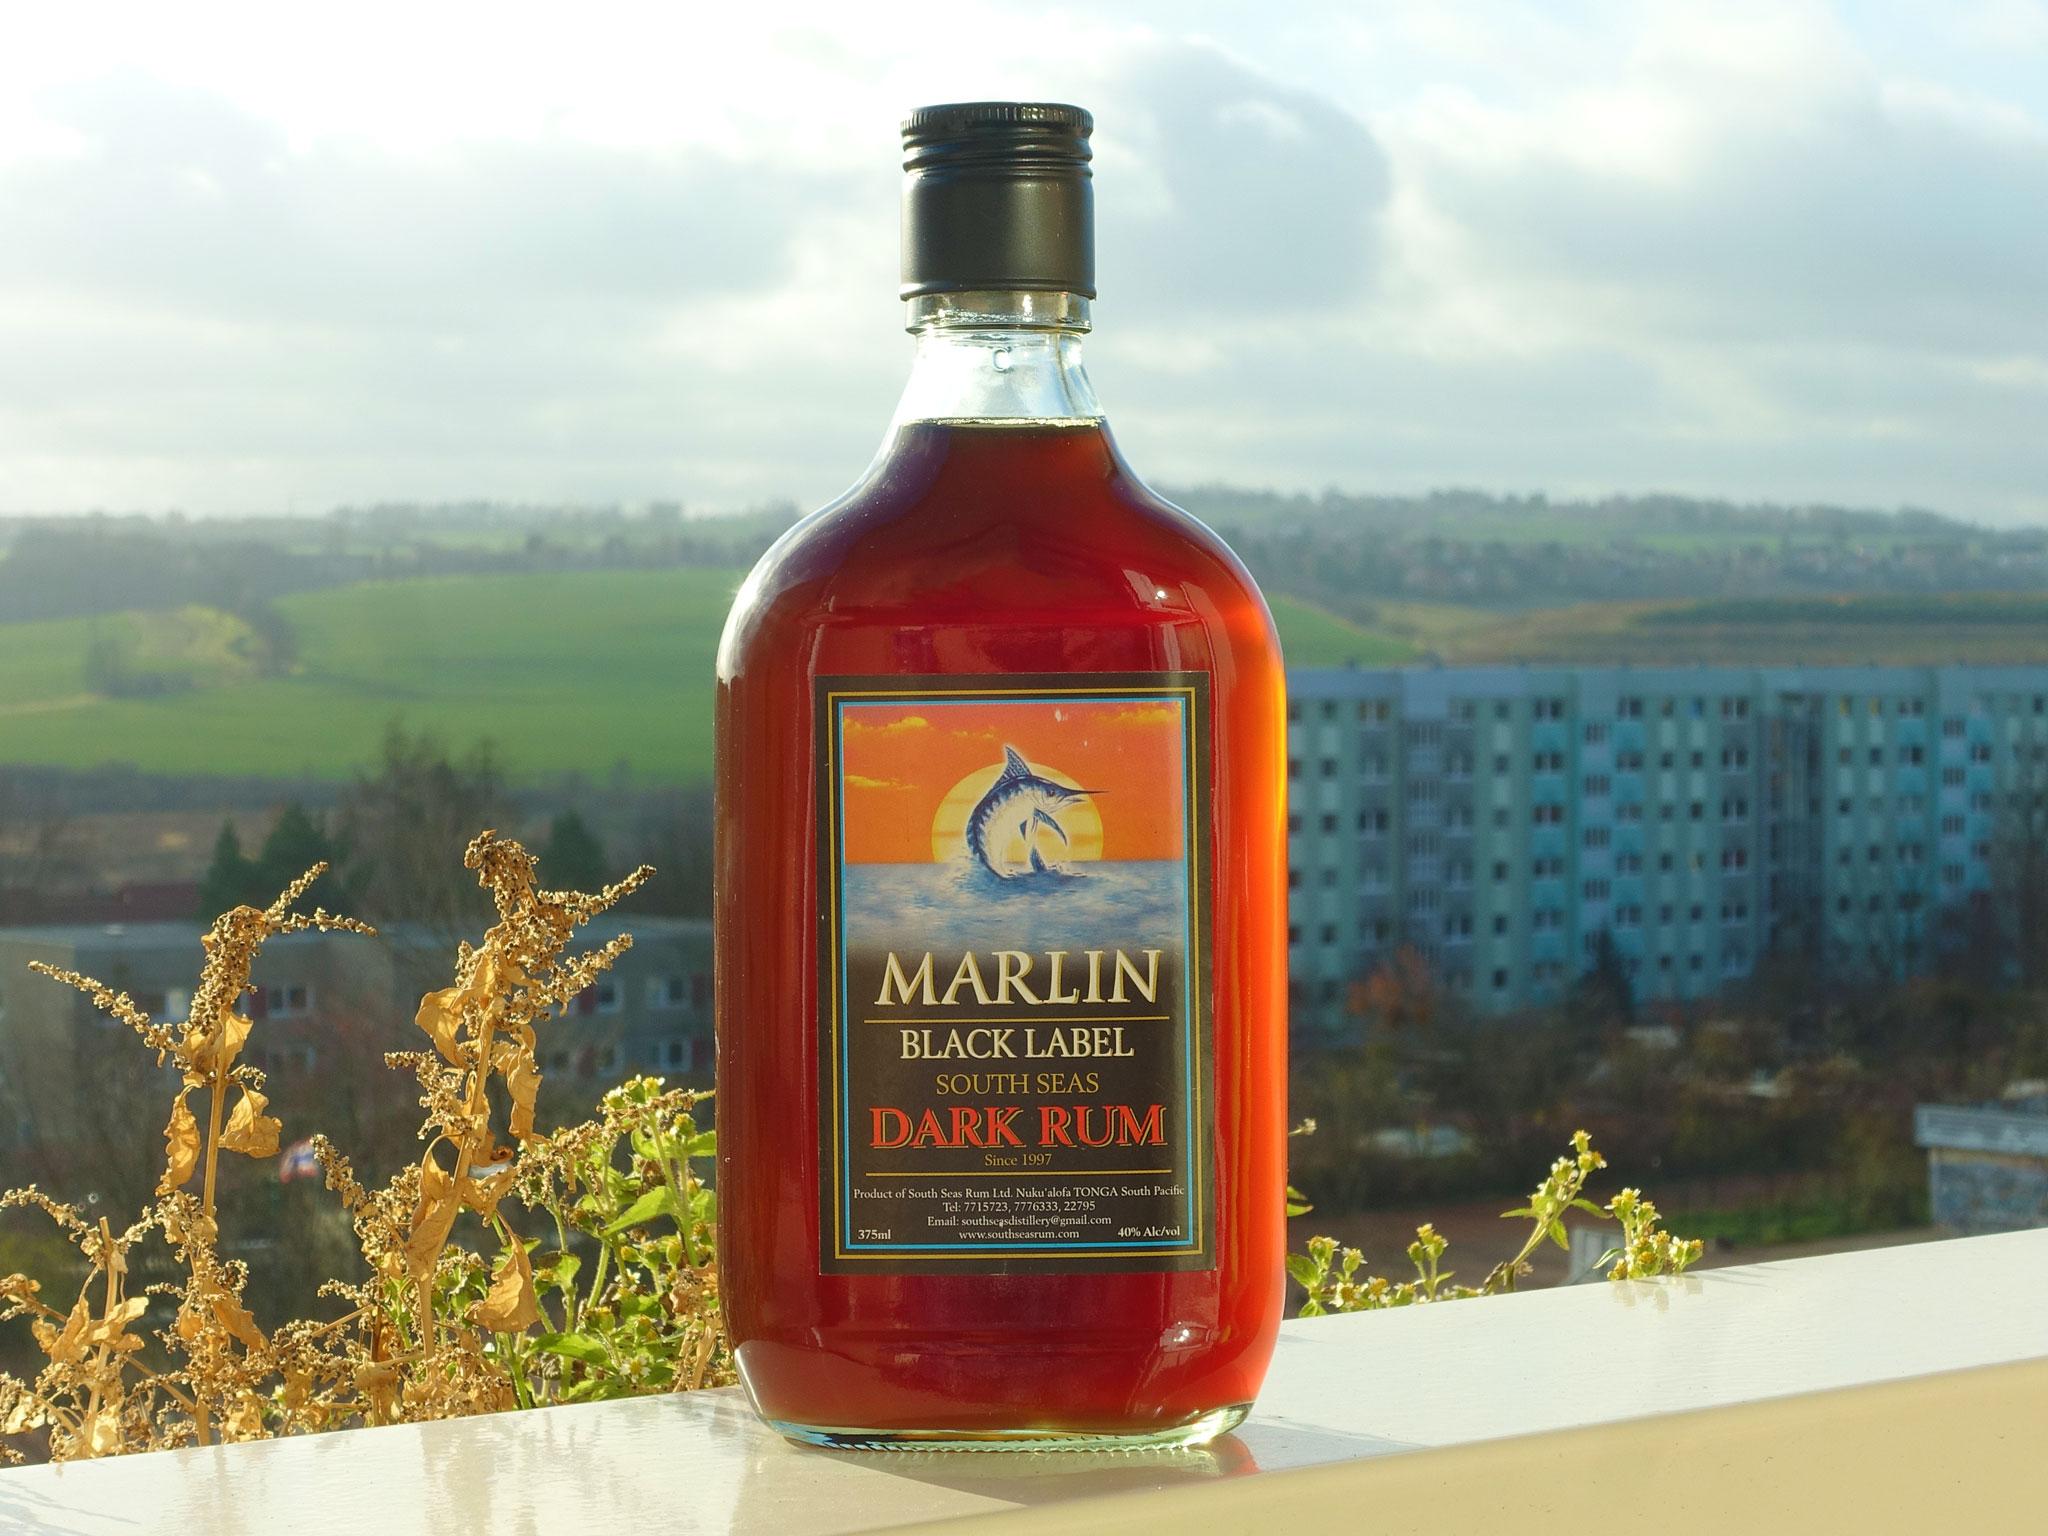 File:Marlin-black-label-rum-tonga.jpg - Wikimedia Commons